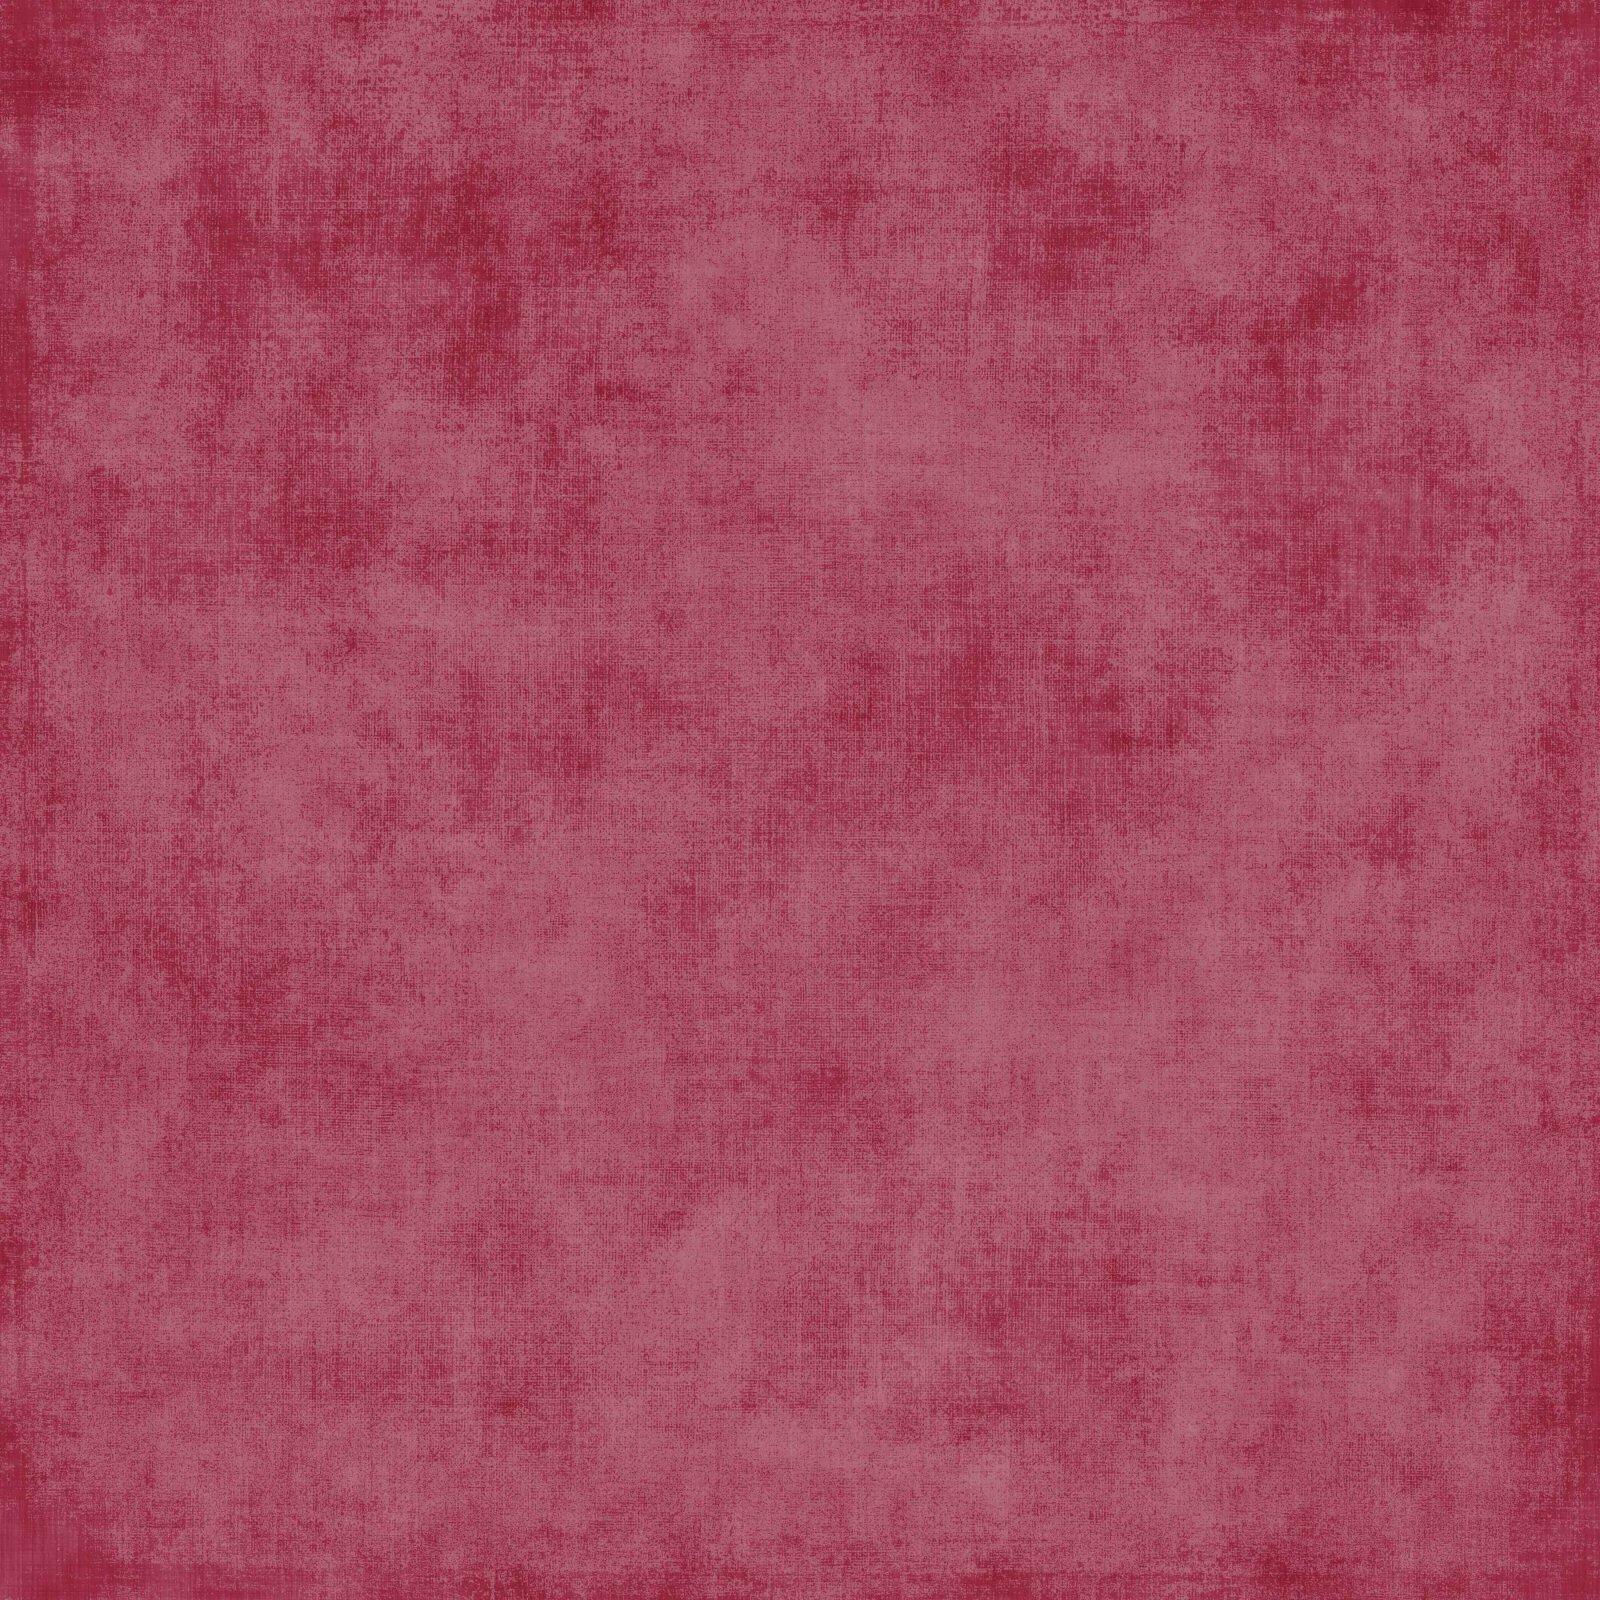 Basic Shade - Burgundy Fabric